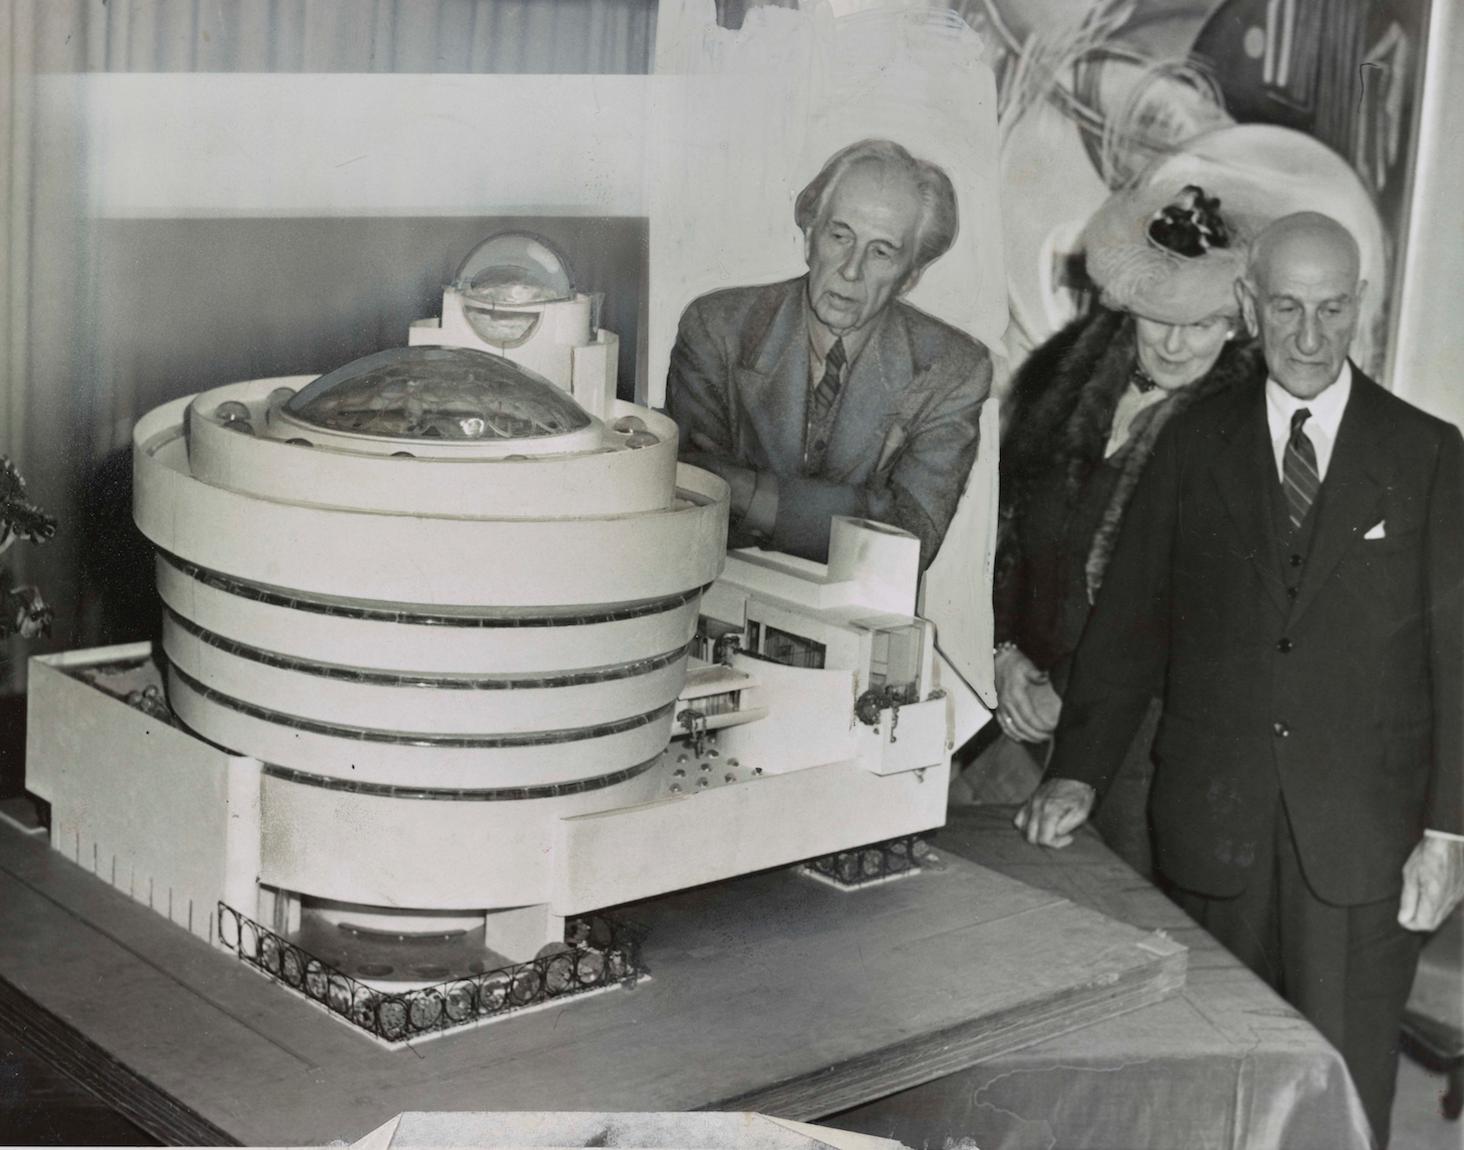 Model of the Guggenheim Museum, Frank Lloyd Wright (left), Hilla von Rebay, and Solomon R. Guggenheim, September 12, 1945.  [Public domain. Courtesy of Library of Congress.]